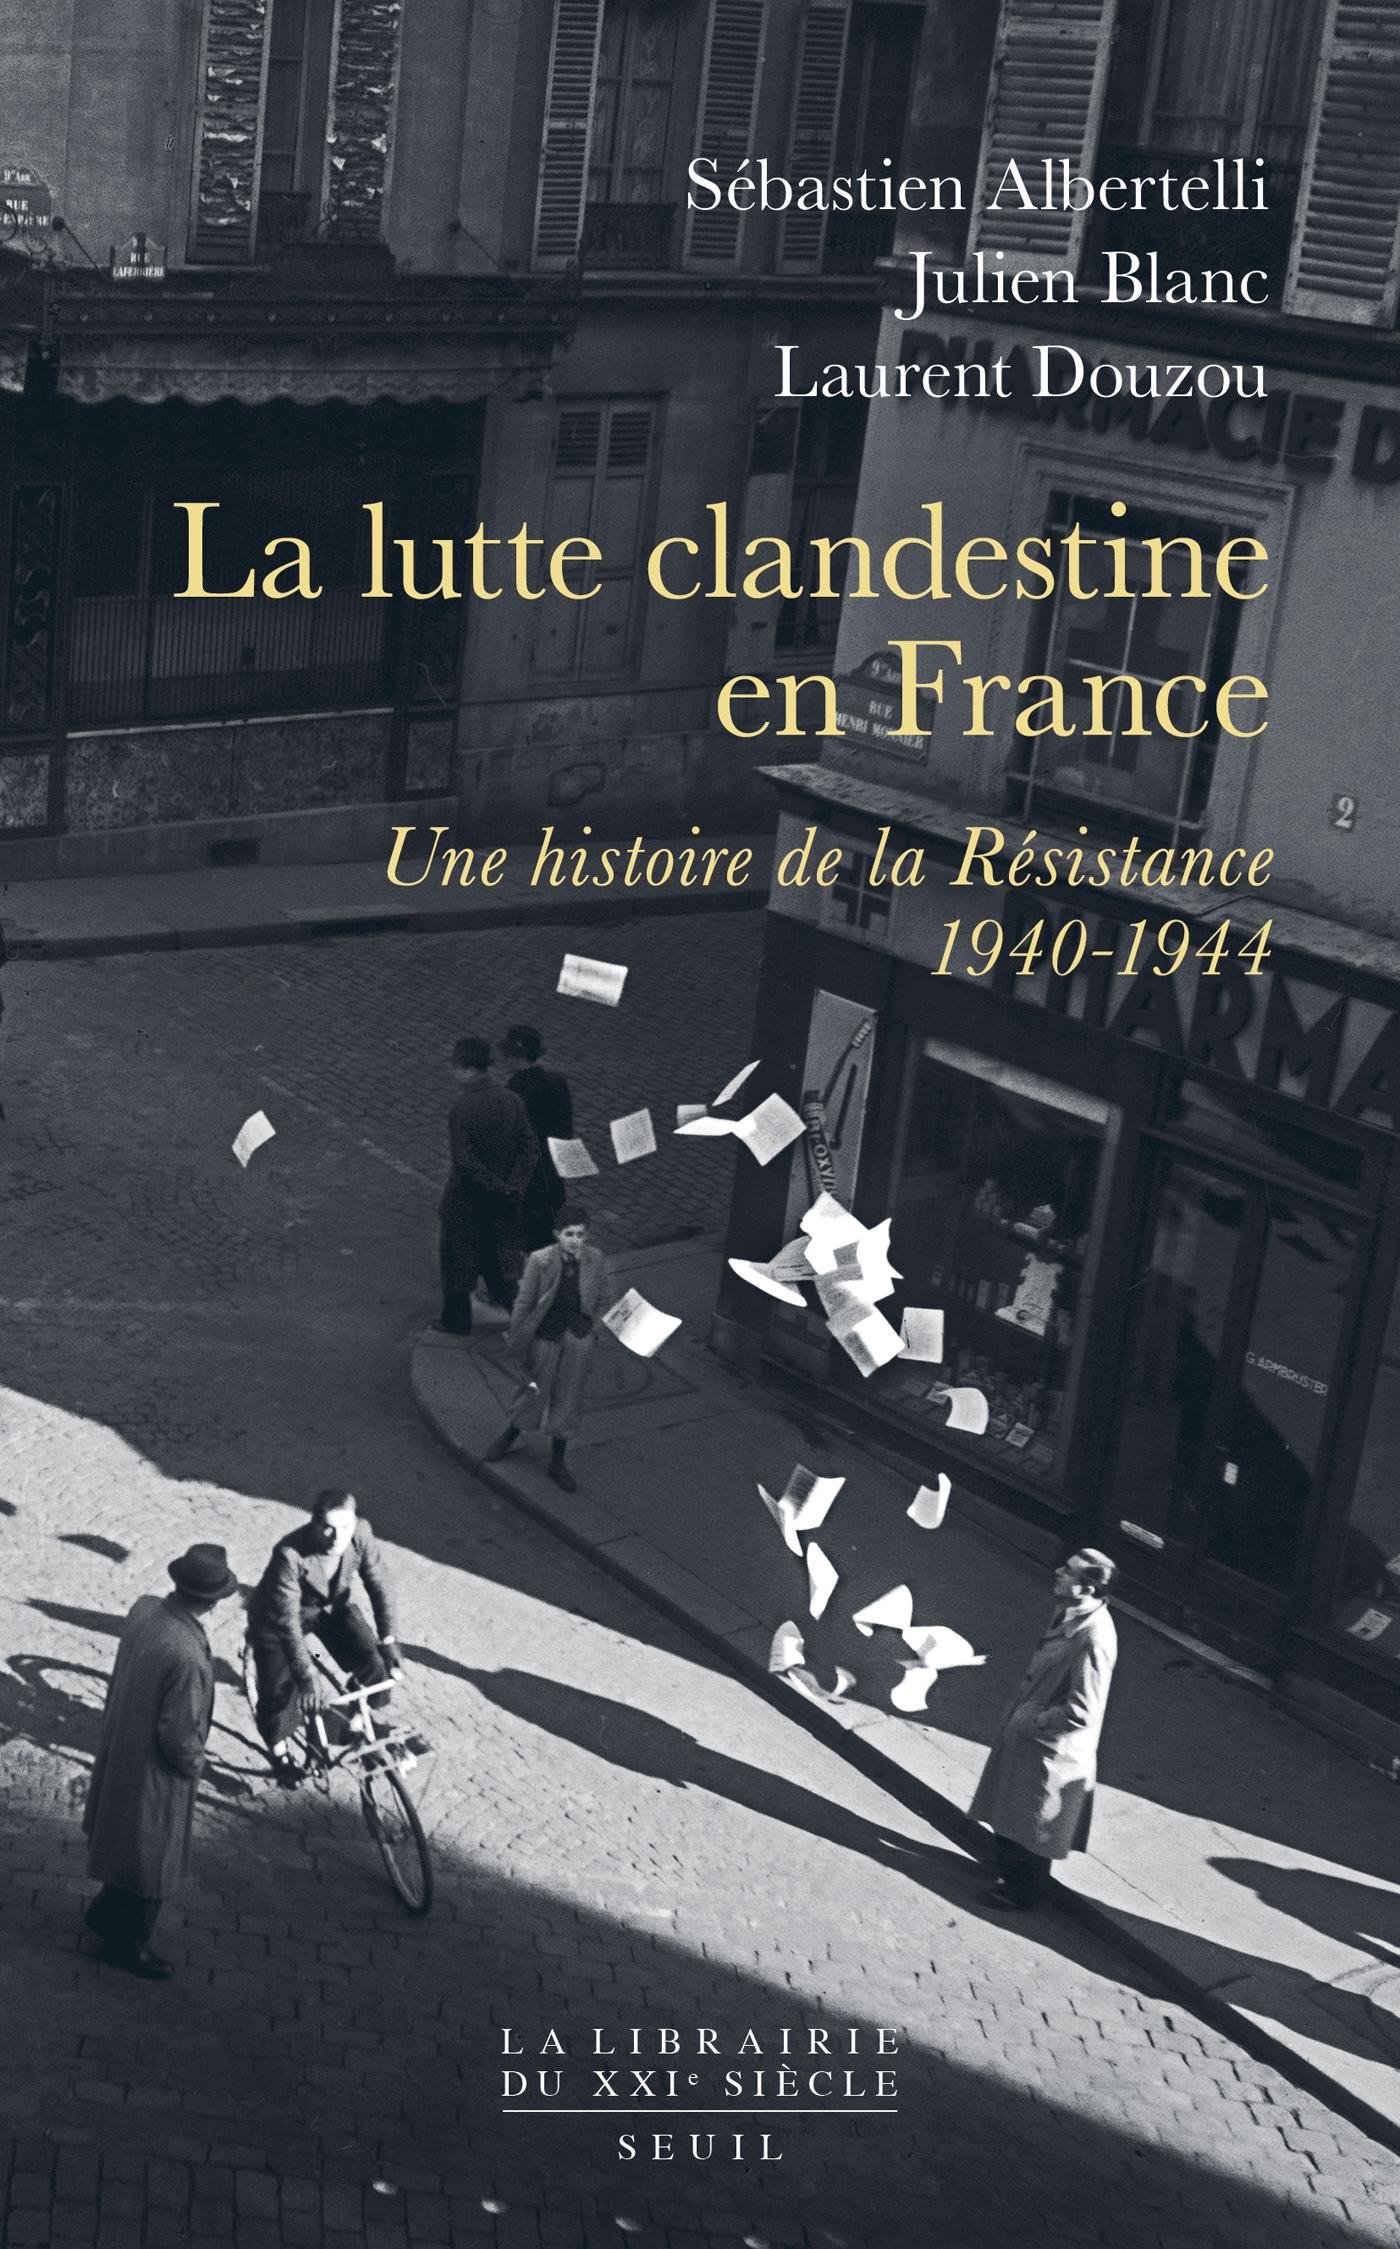 La lutte clandestine en France